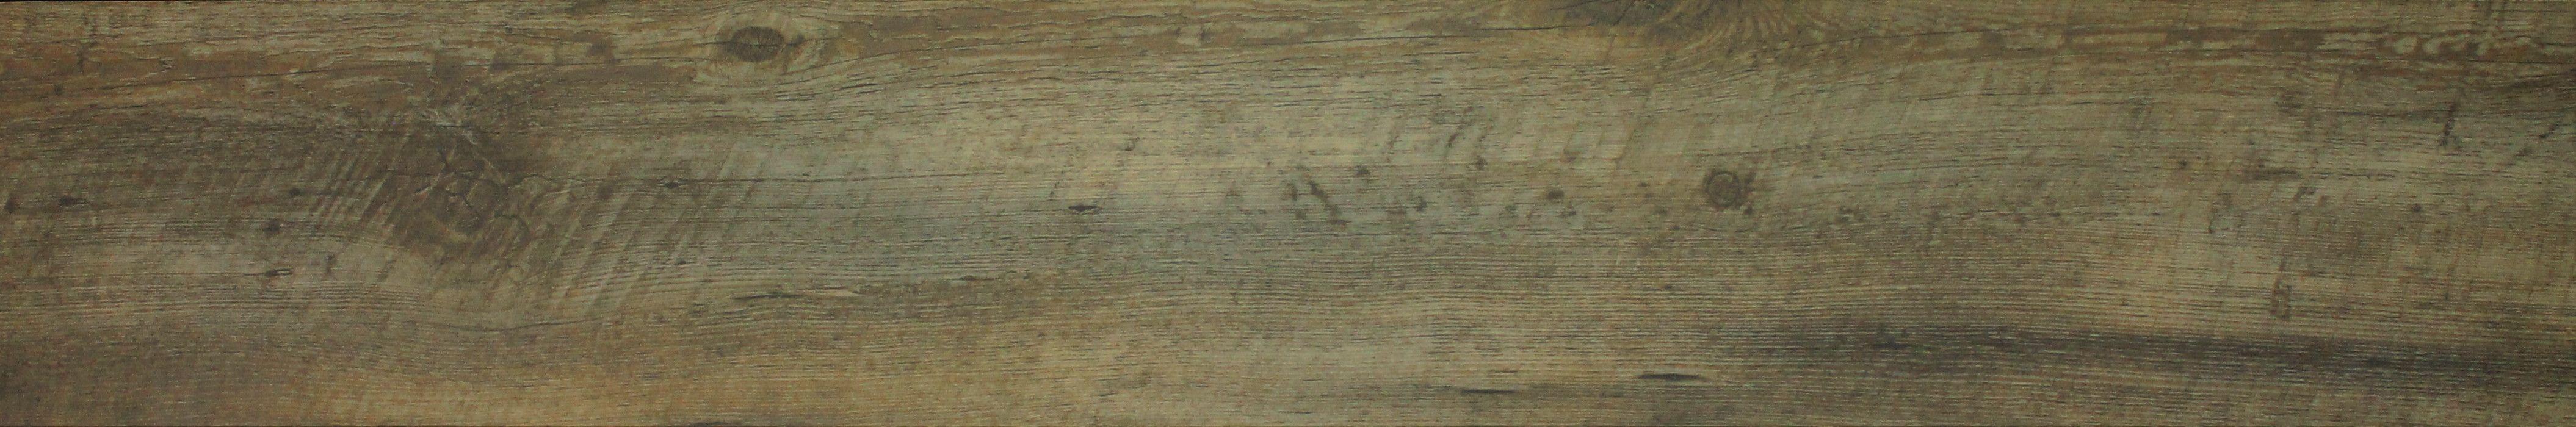 fkeu amazona rustik grau holzoptik bodenfliese 20x120 cm r9 art nr fkeu0990389 fliesen in. Black Bedroom Furniture Sets. Home Design Ideas